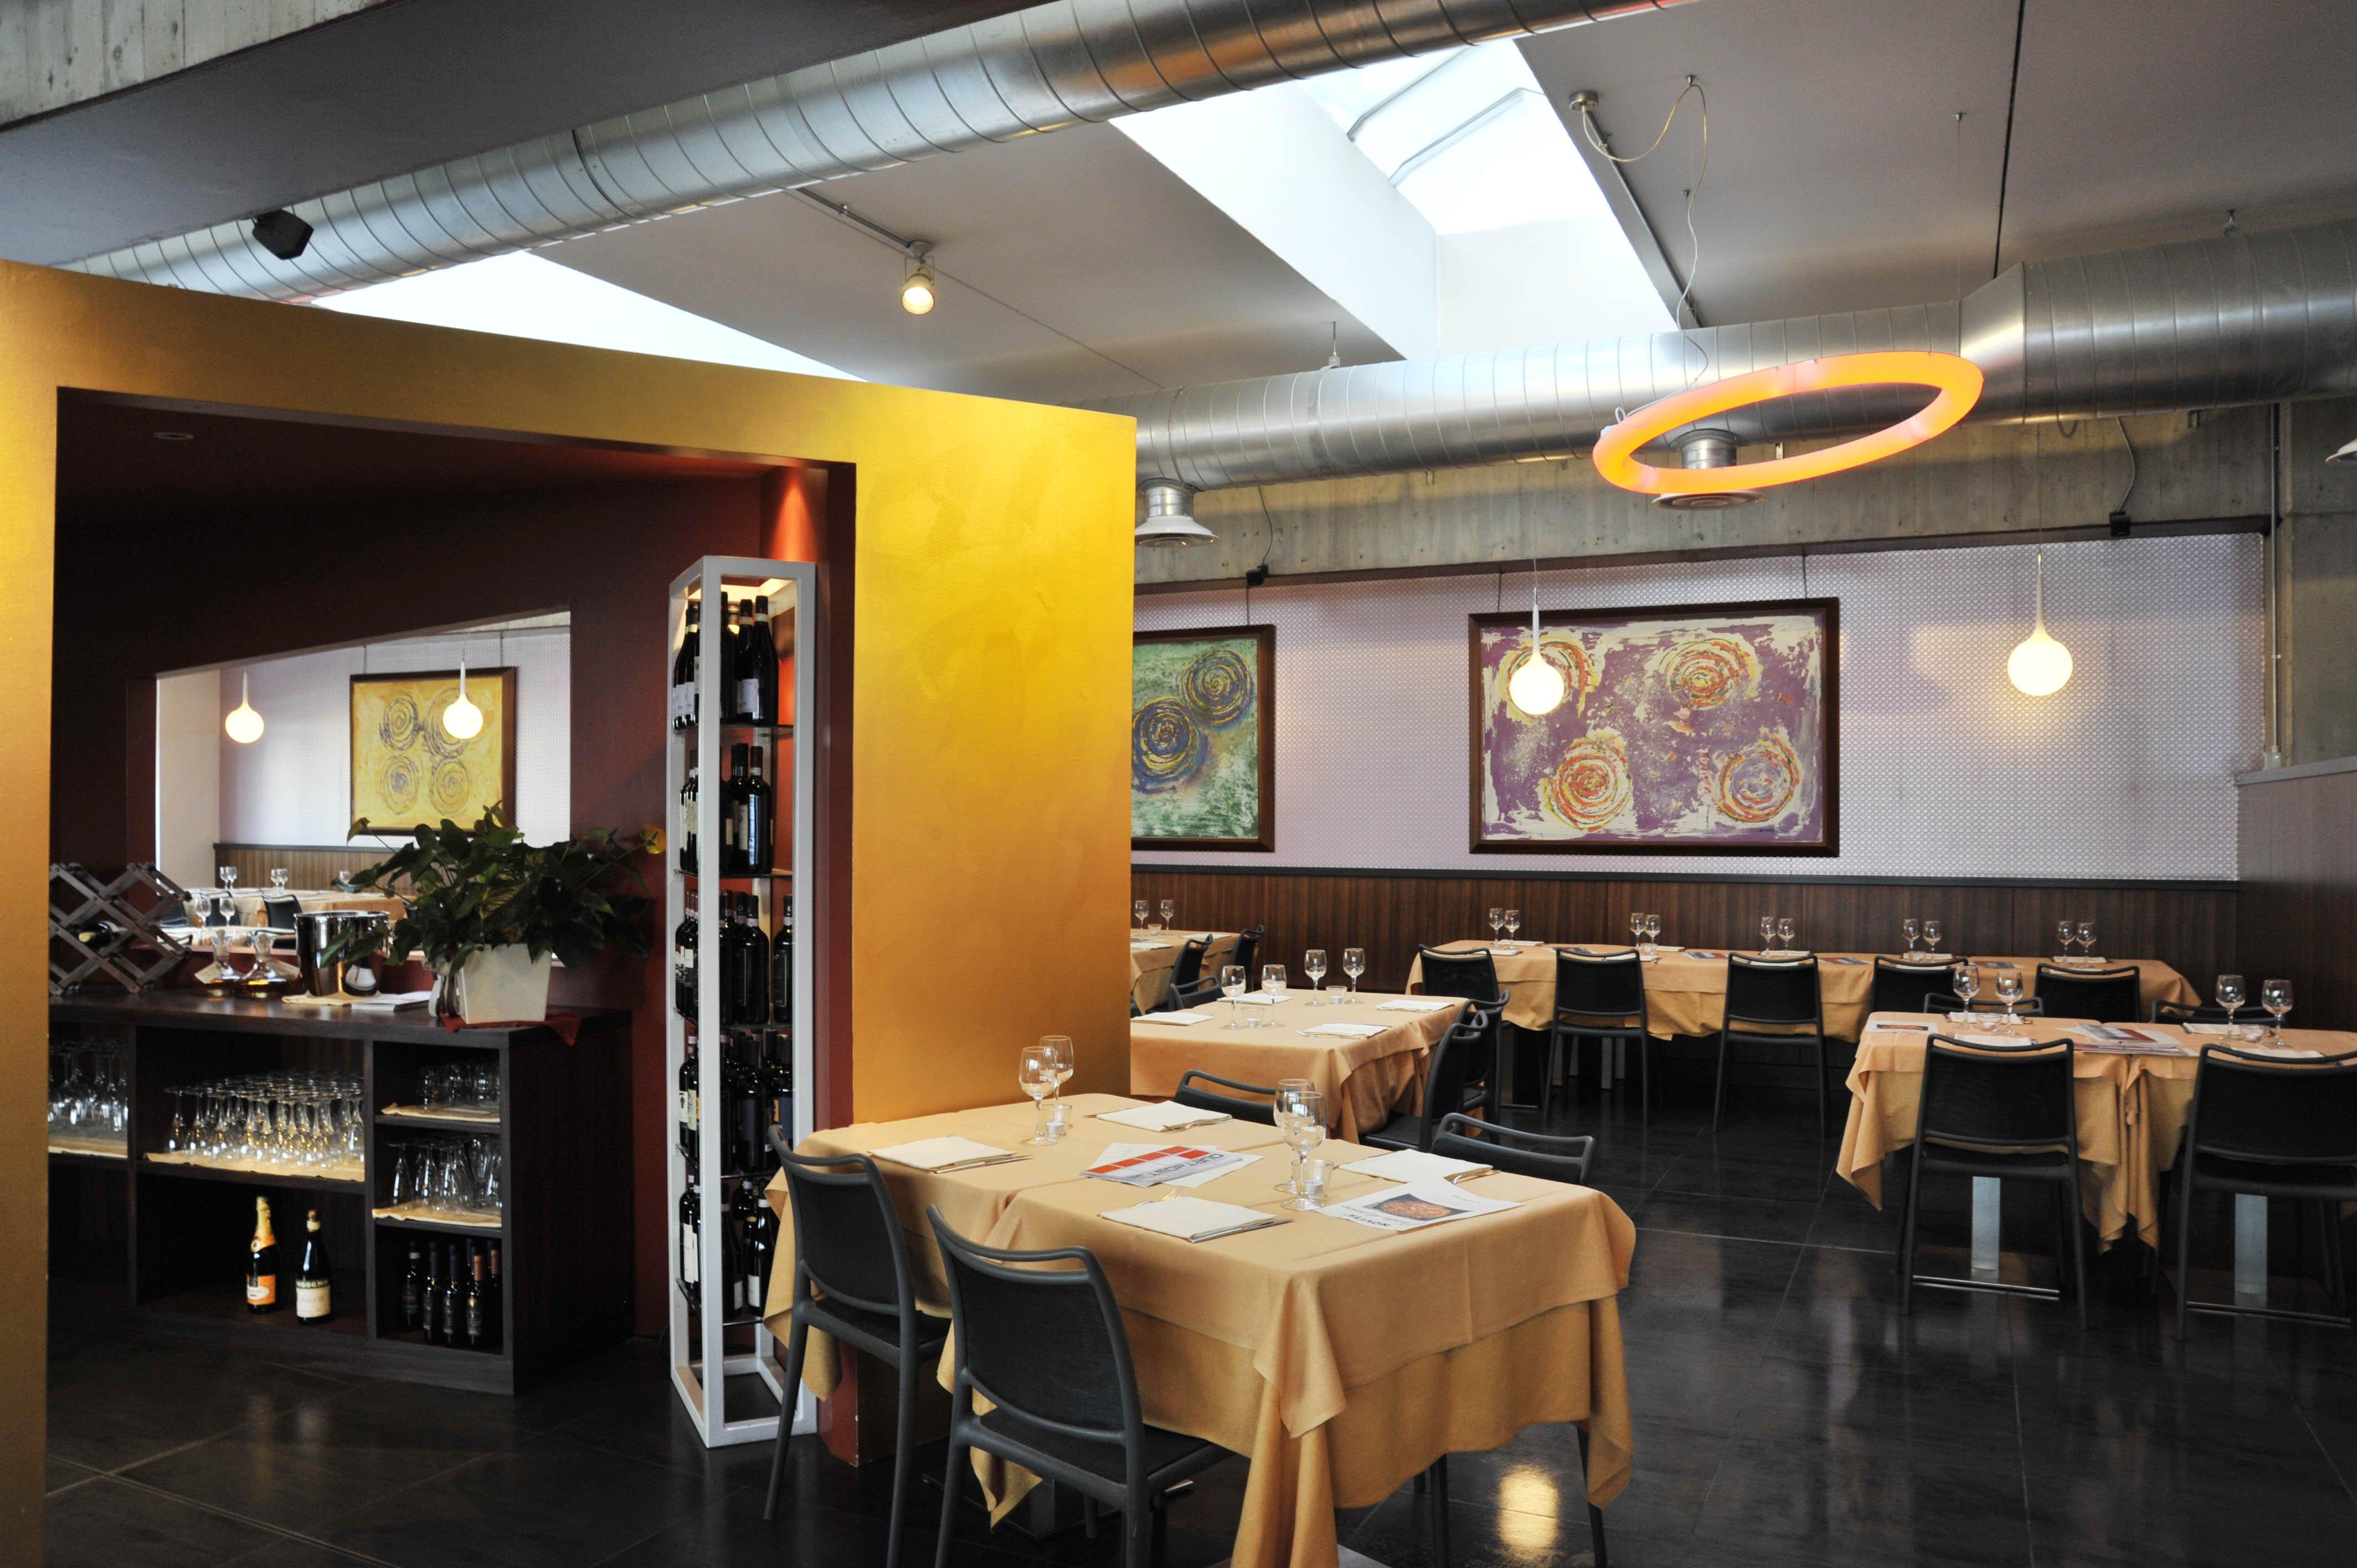 vista dei tavoli nel ristorante